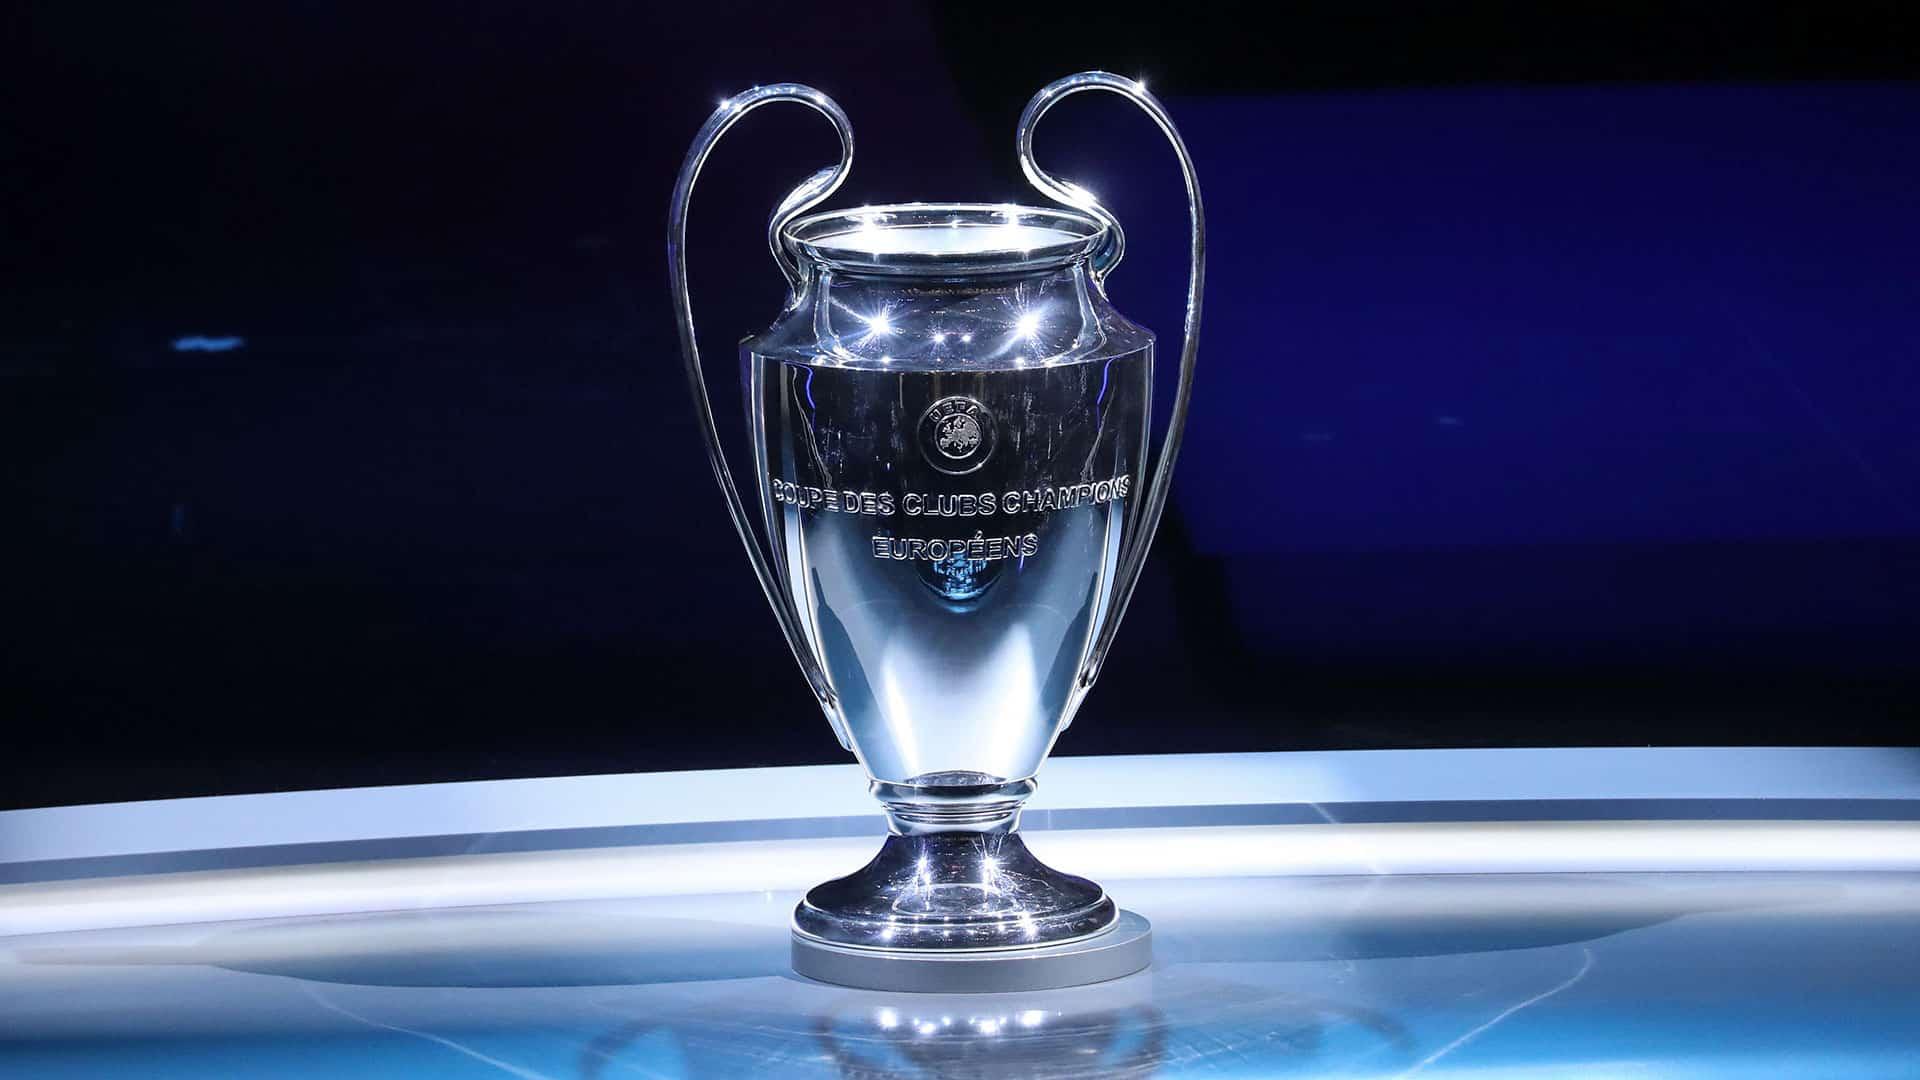 04/05/2021 Daily Predictions: UEFA Champions League – Manchester City vs PSG